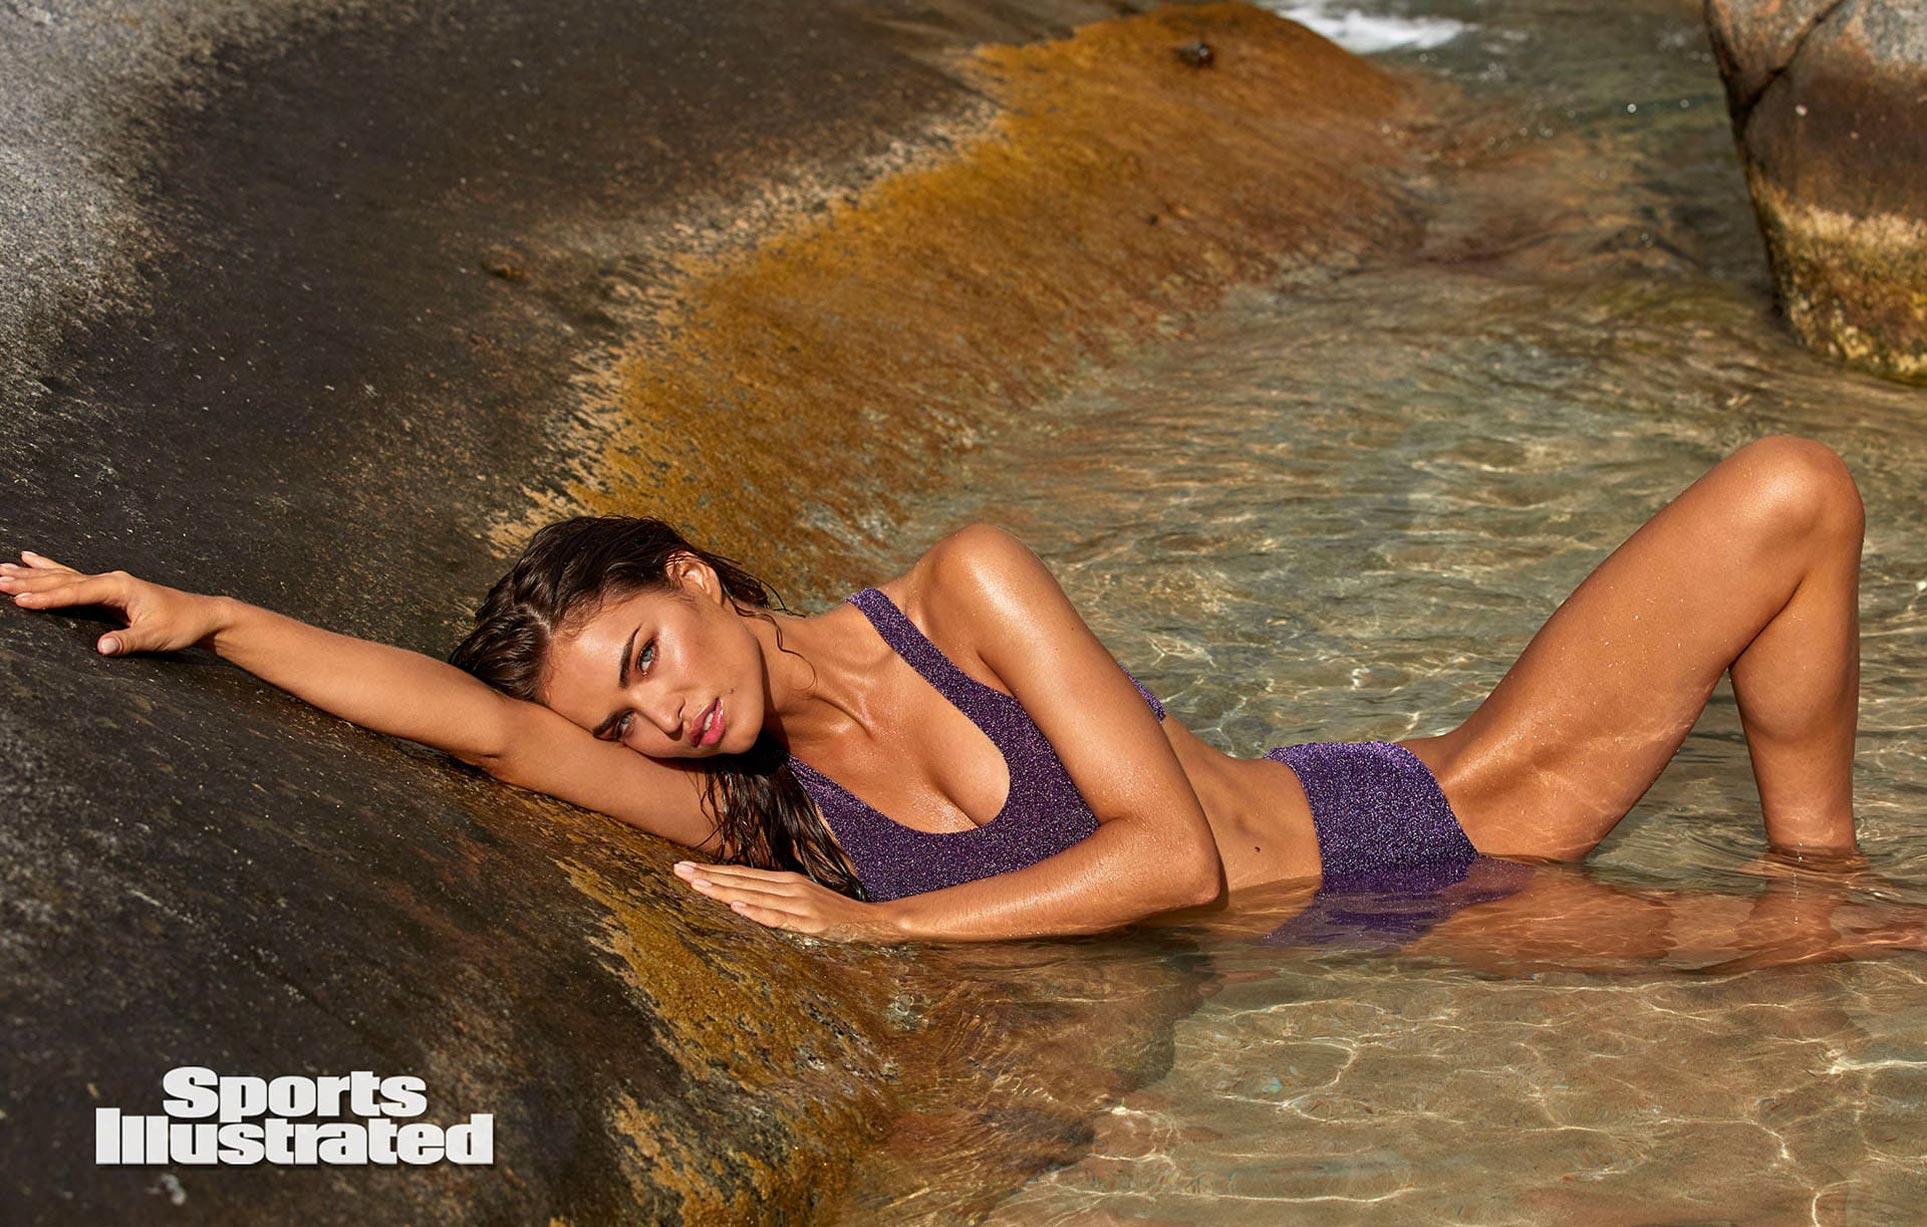 Робин Хольцкен в каталоге купальников Sports Illustrated Swimsuit 2020 / фото 07